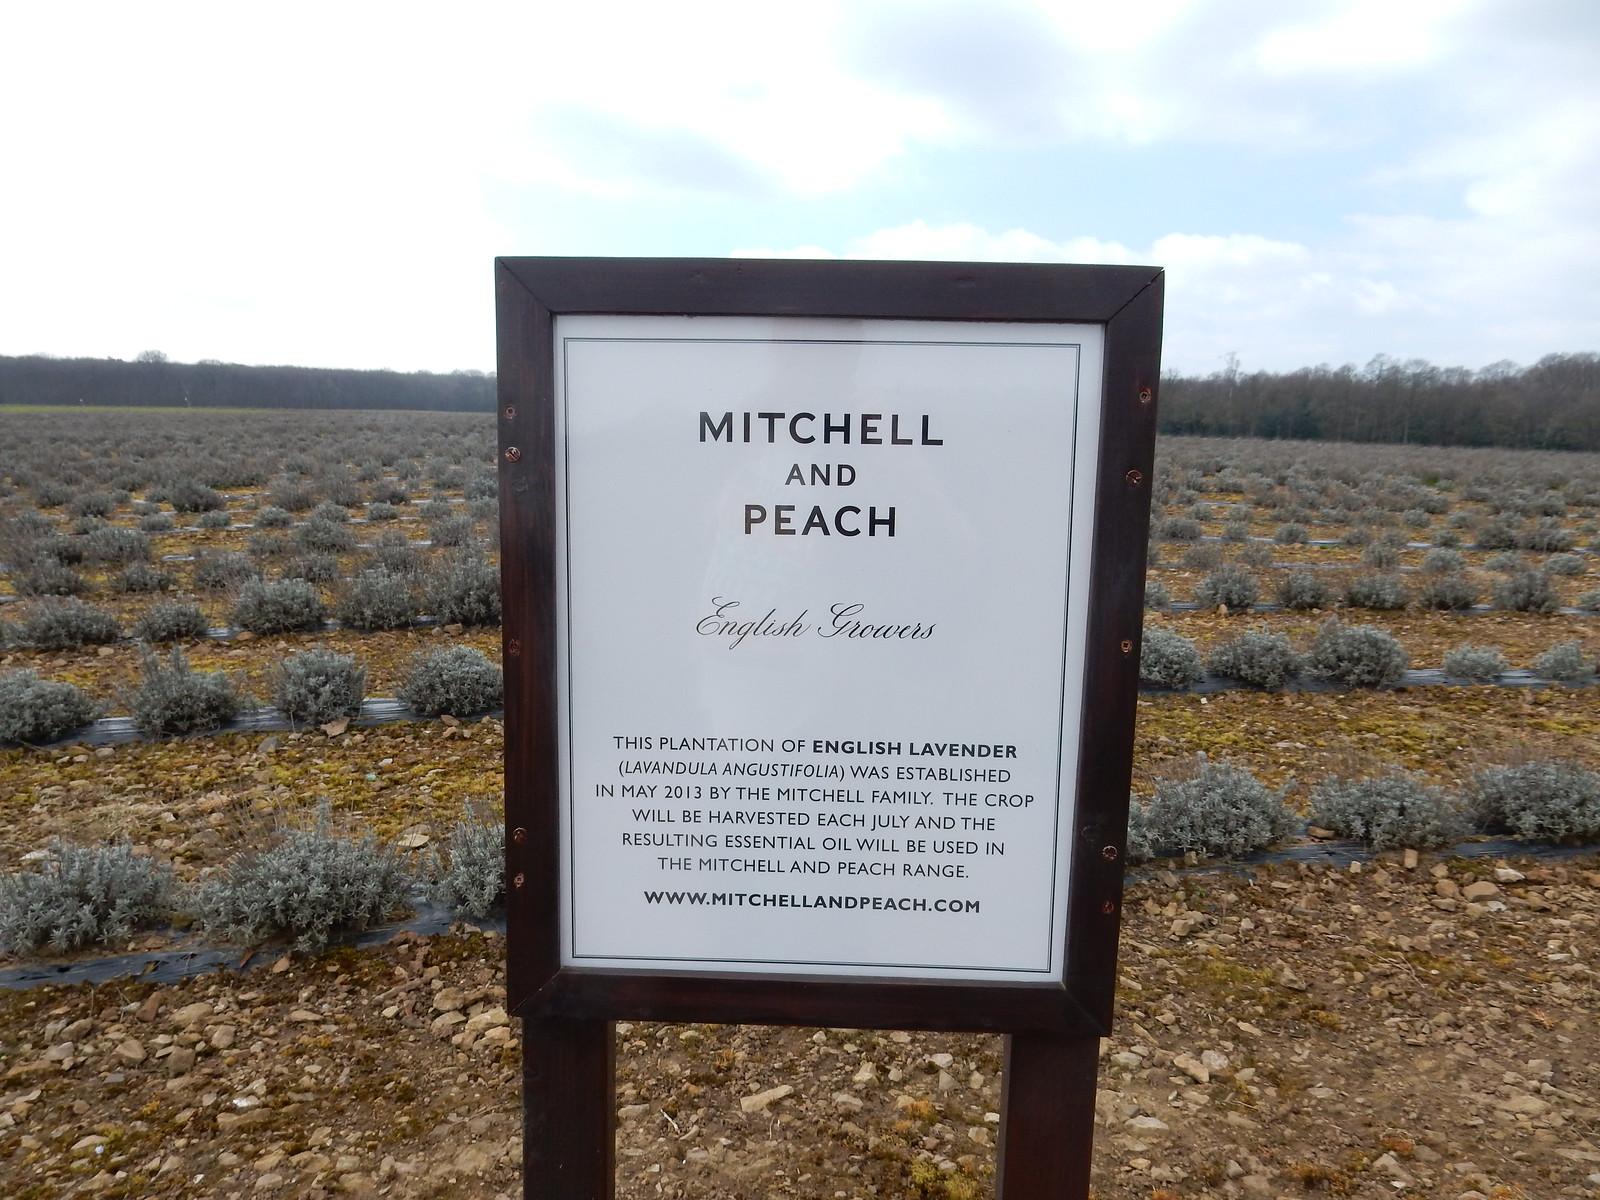 New lavender fields Sevenoaks Circular Where the orchards were.